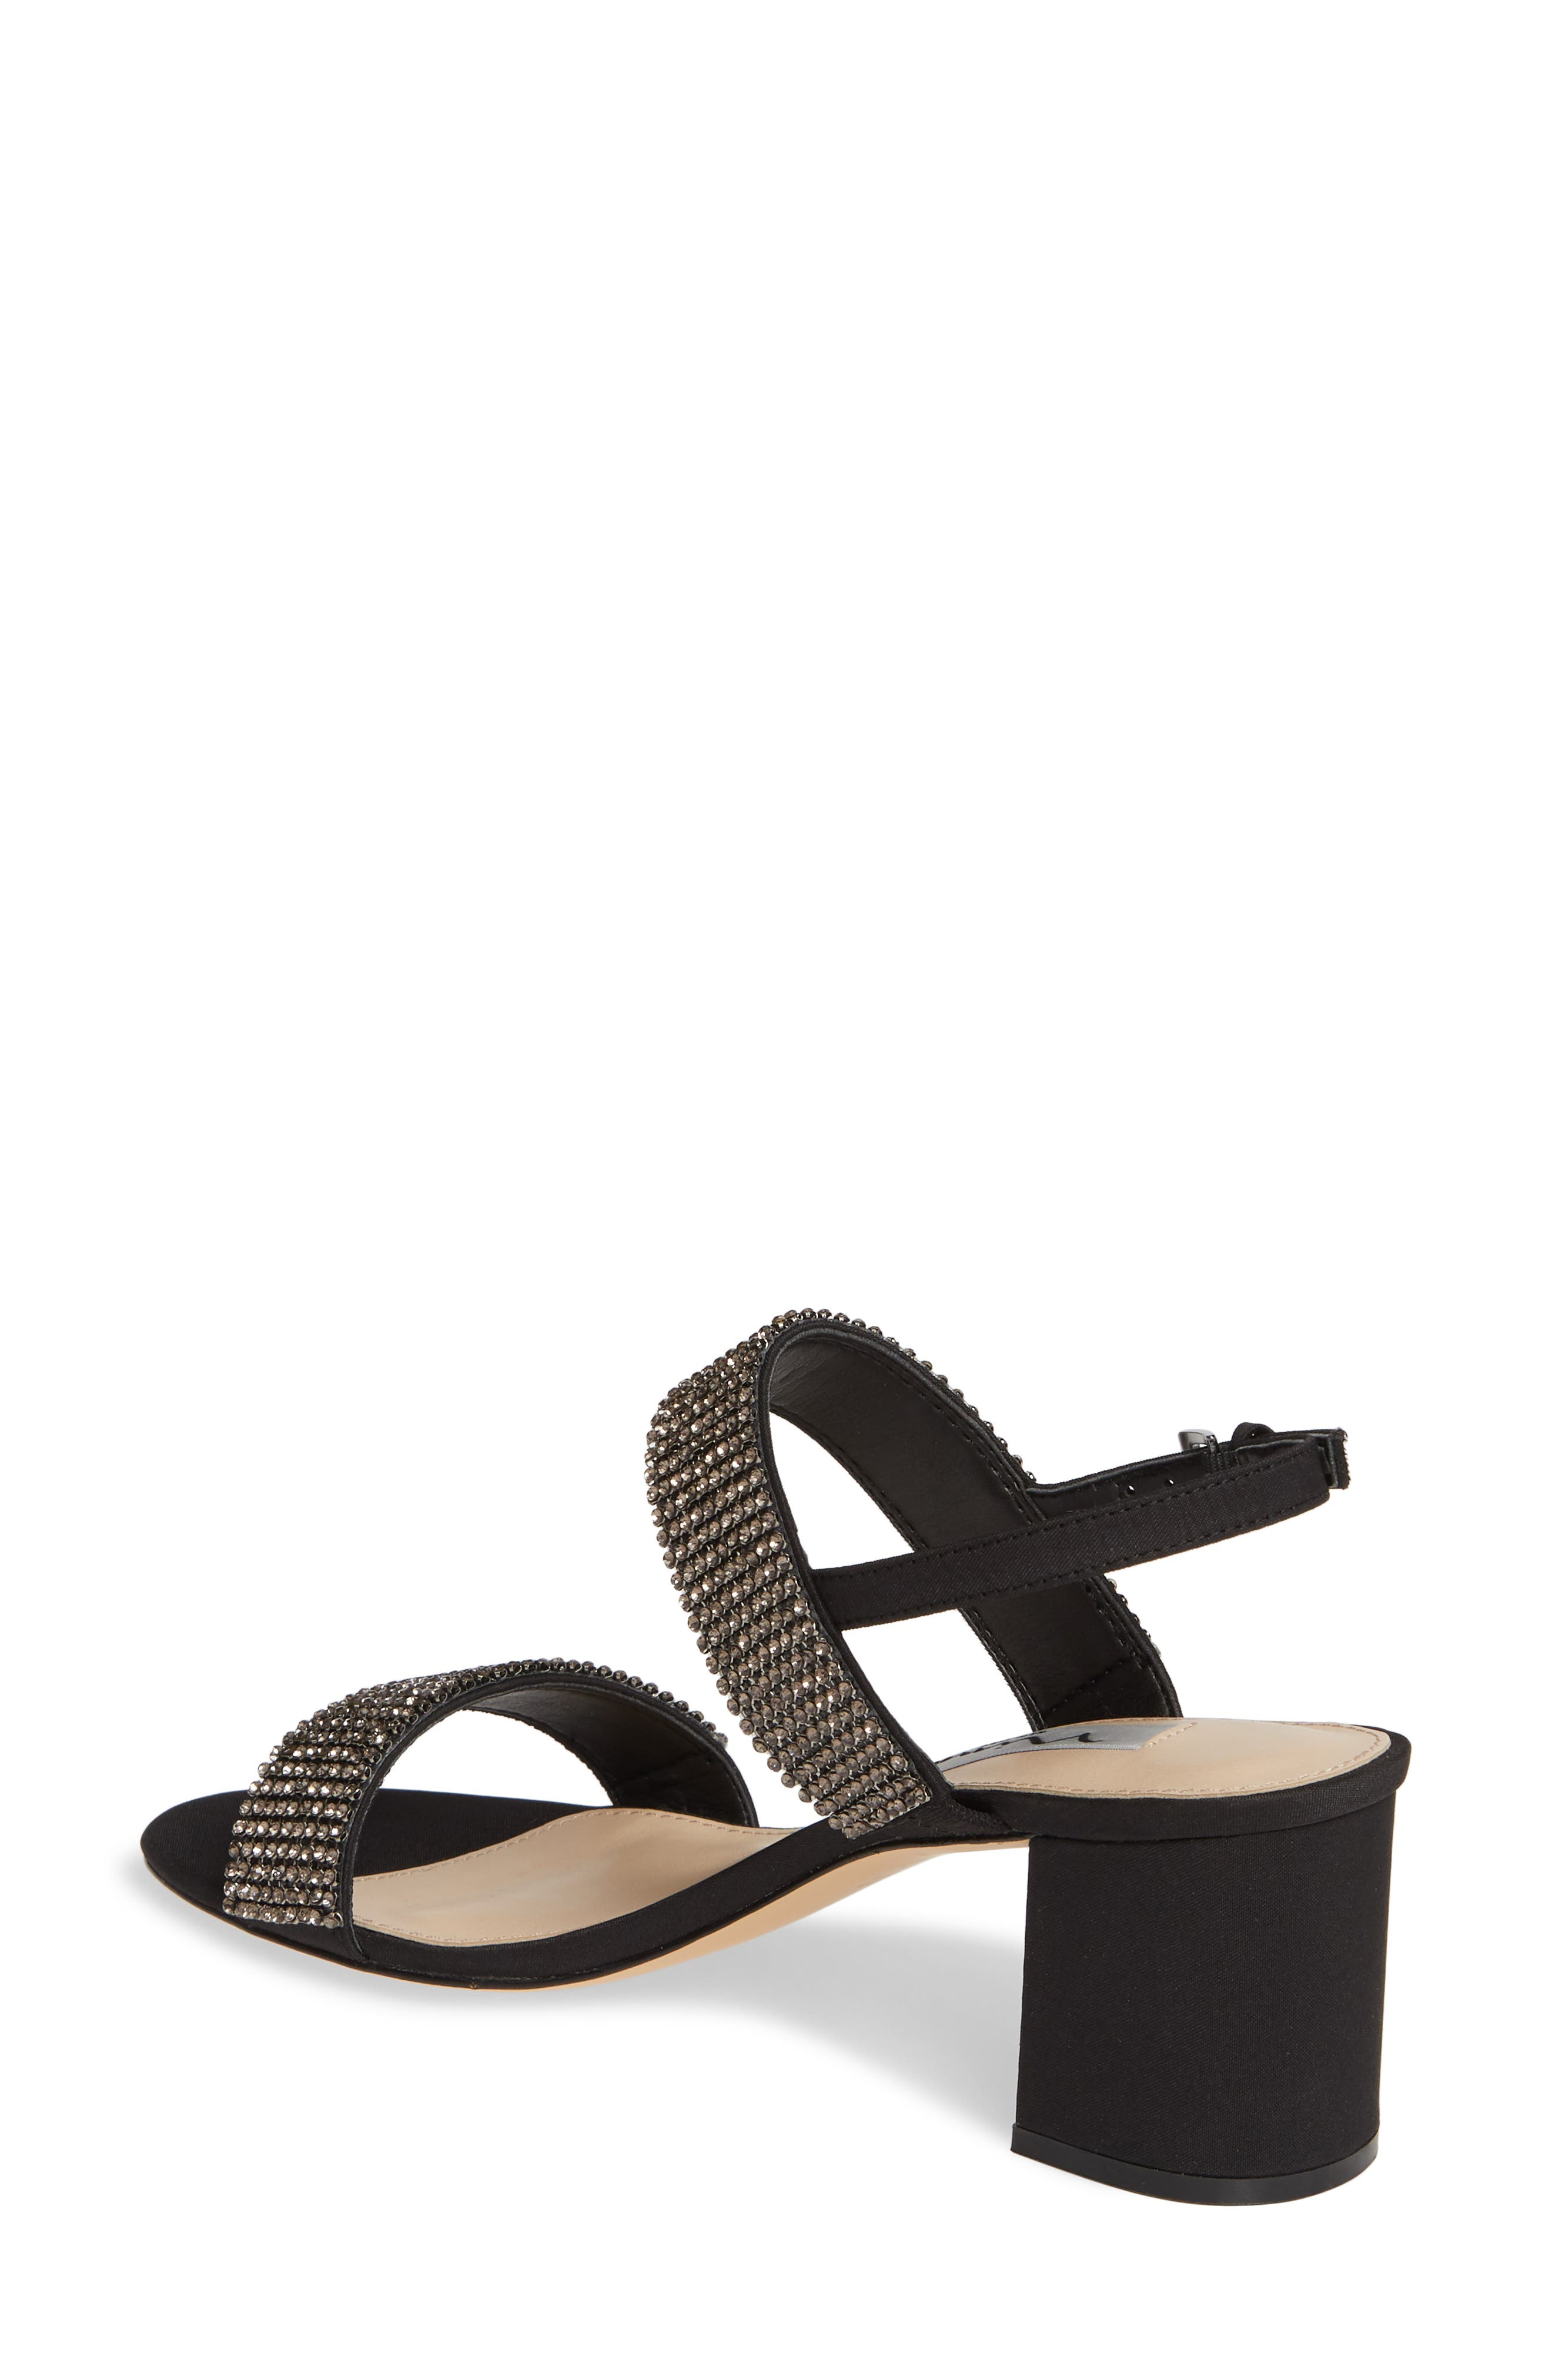 Naomi Crystal Embellished Sandal,                             Alternate thumbnail 2, color,                             BLACK FABRIC